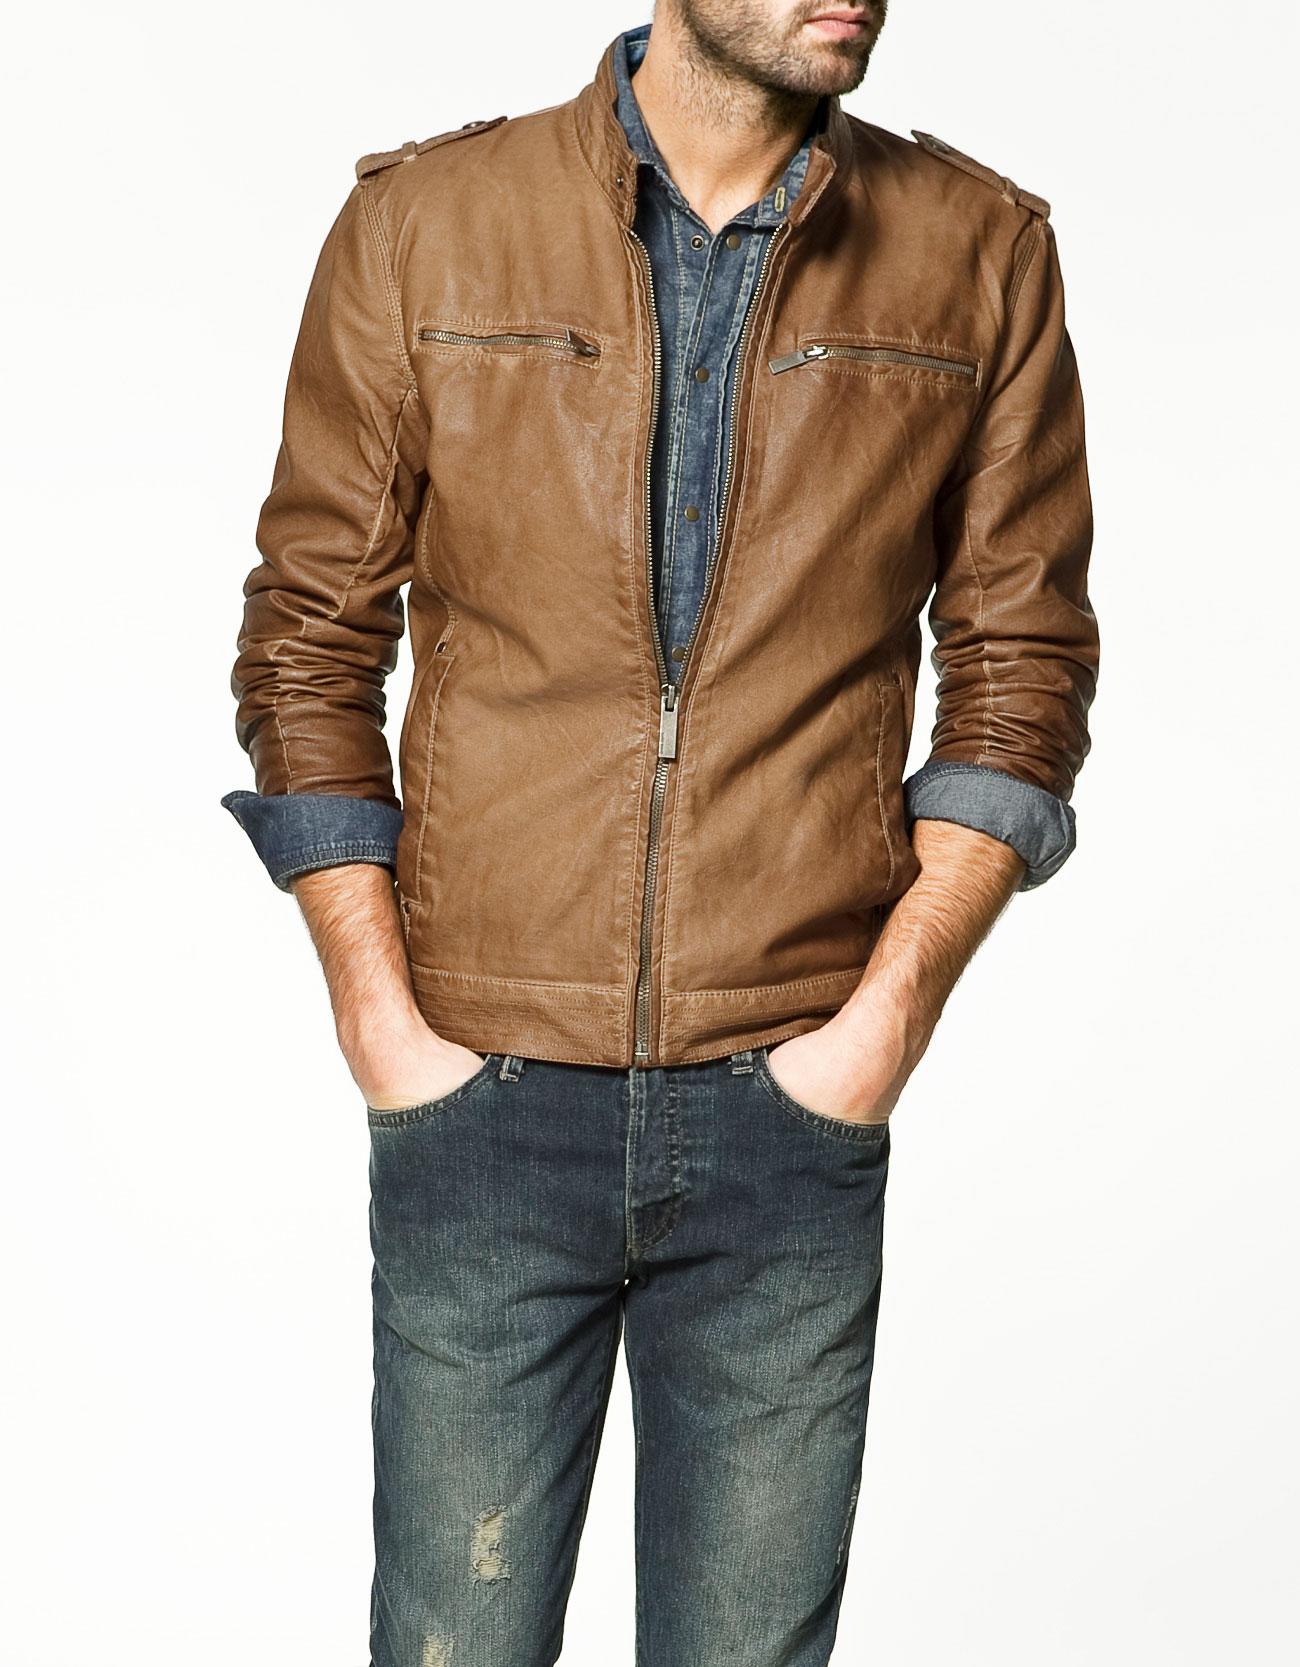 Leather Jackets Zara Men Priletai Com